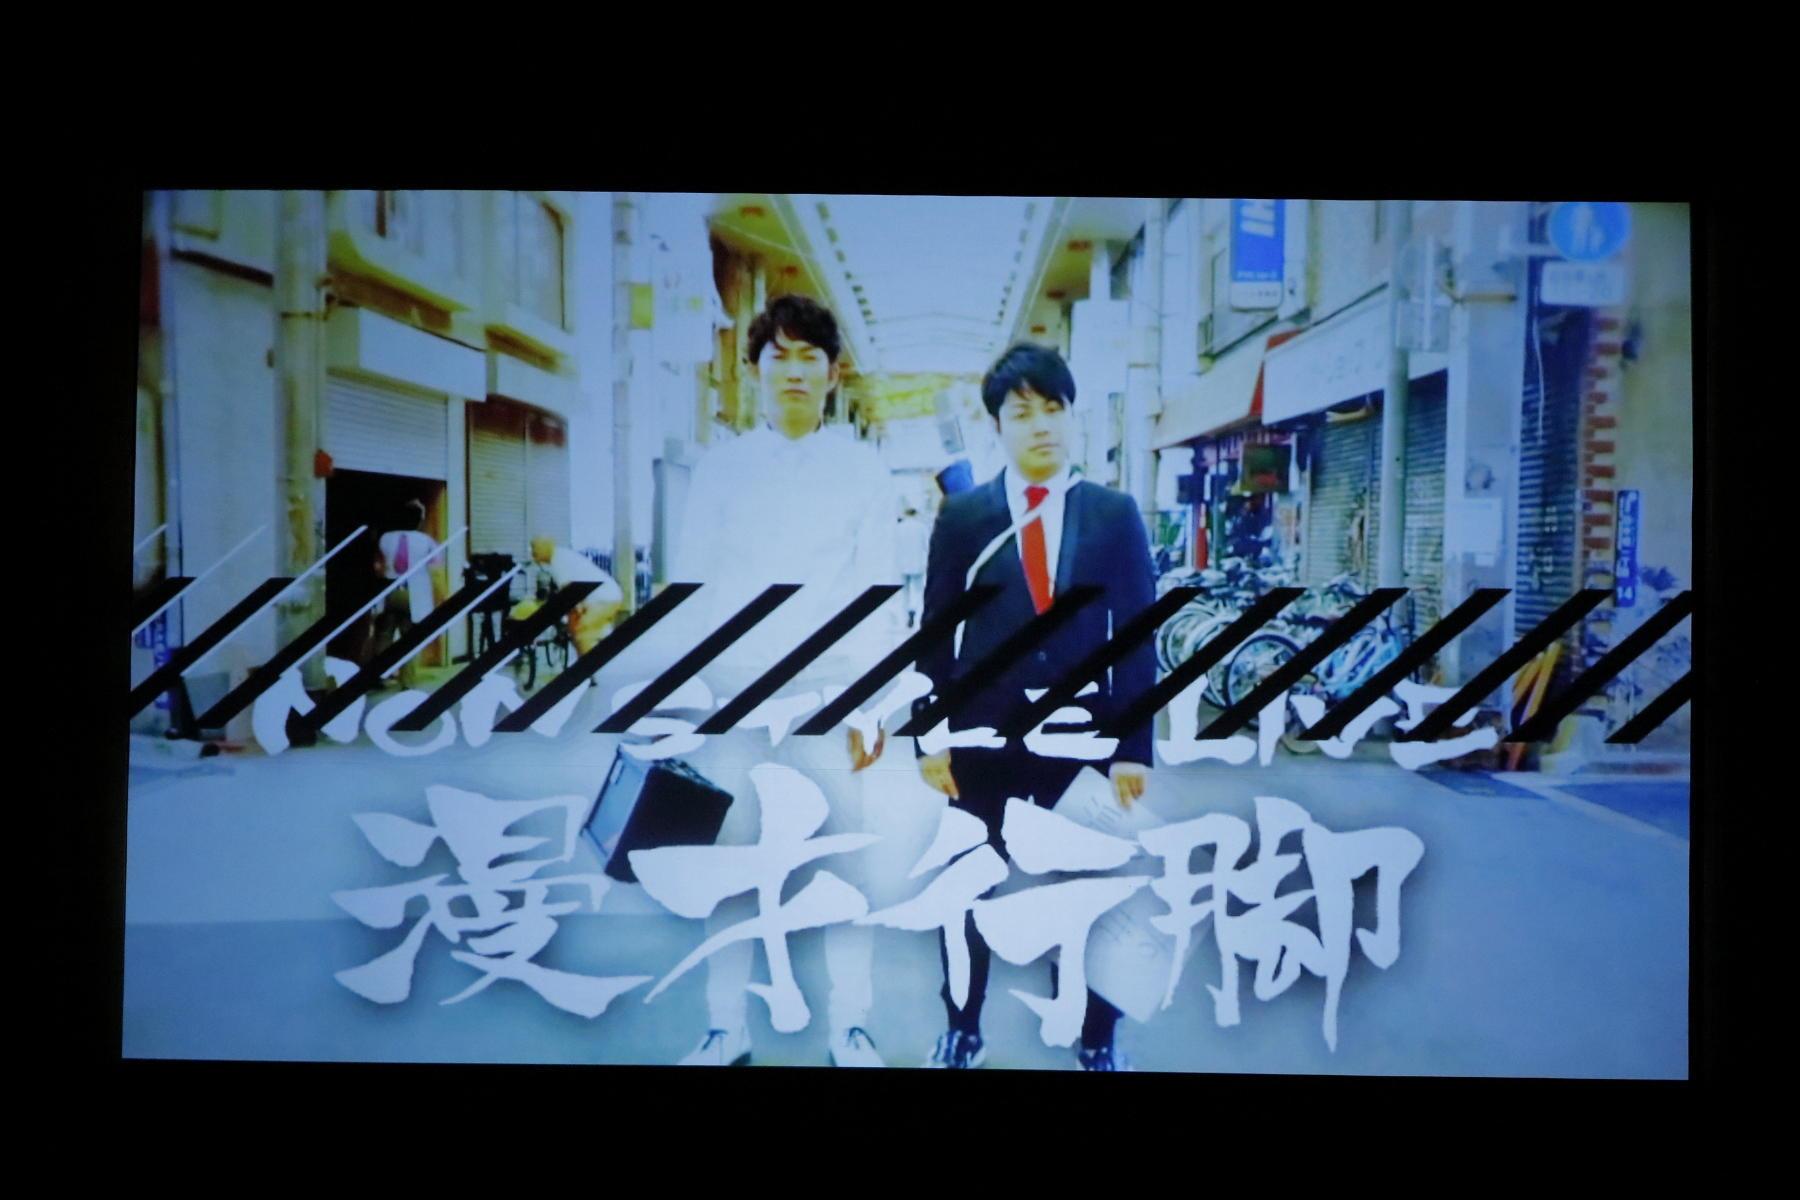 http://news.yoshimoto.co.jp/20171112123917-92ad09fa6ee2f890d5bcacd408f82386de2ba6ec.jpg